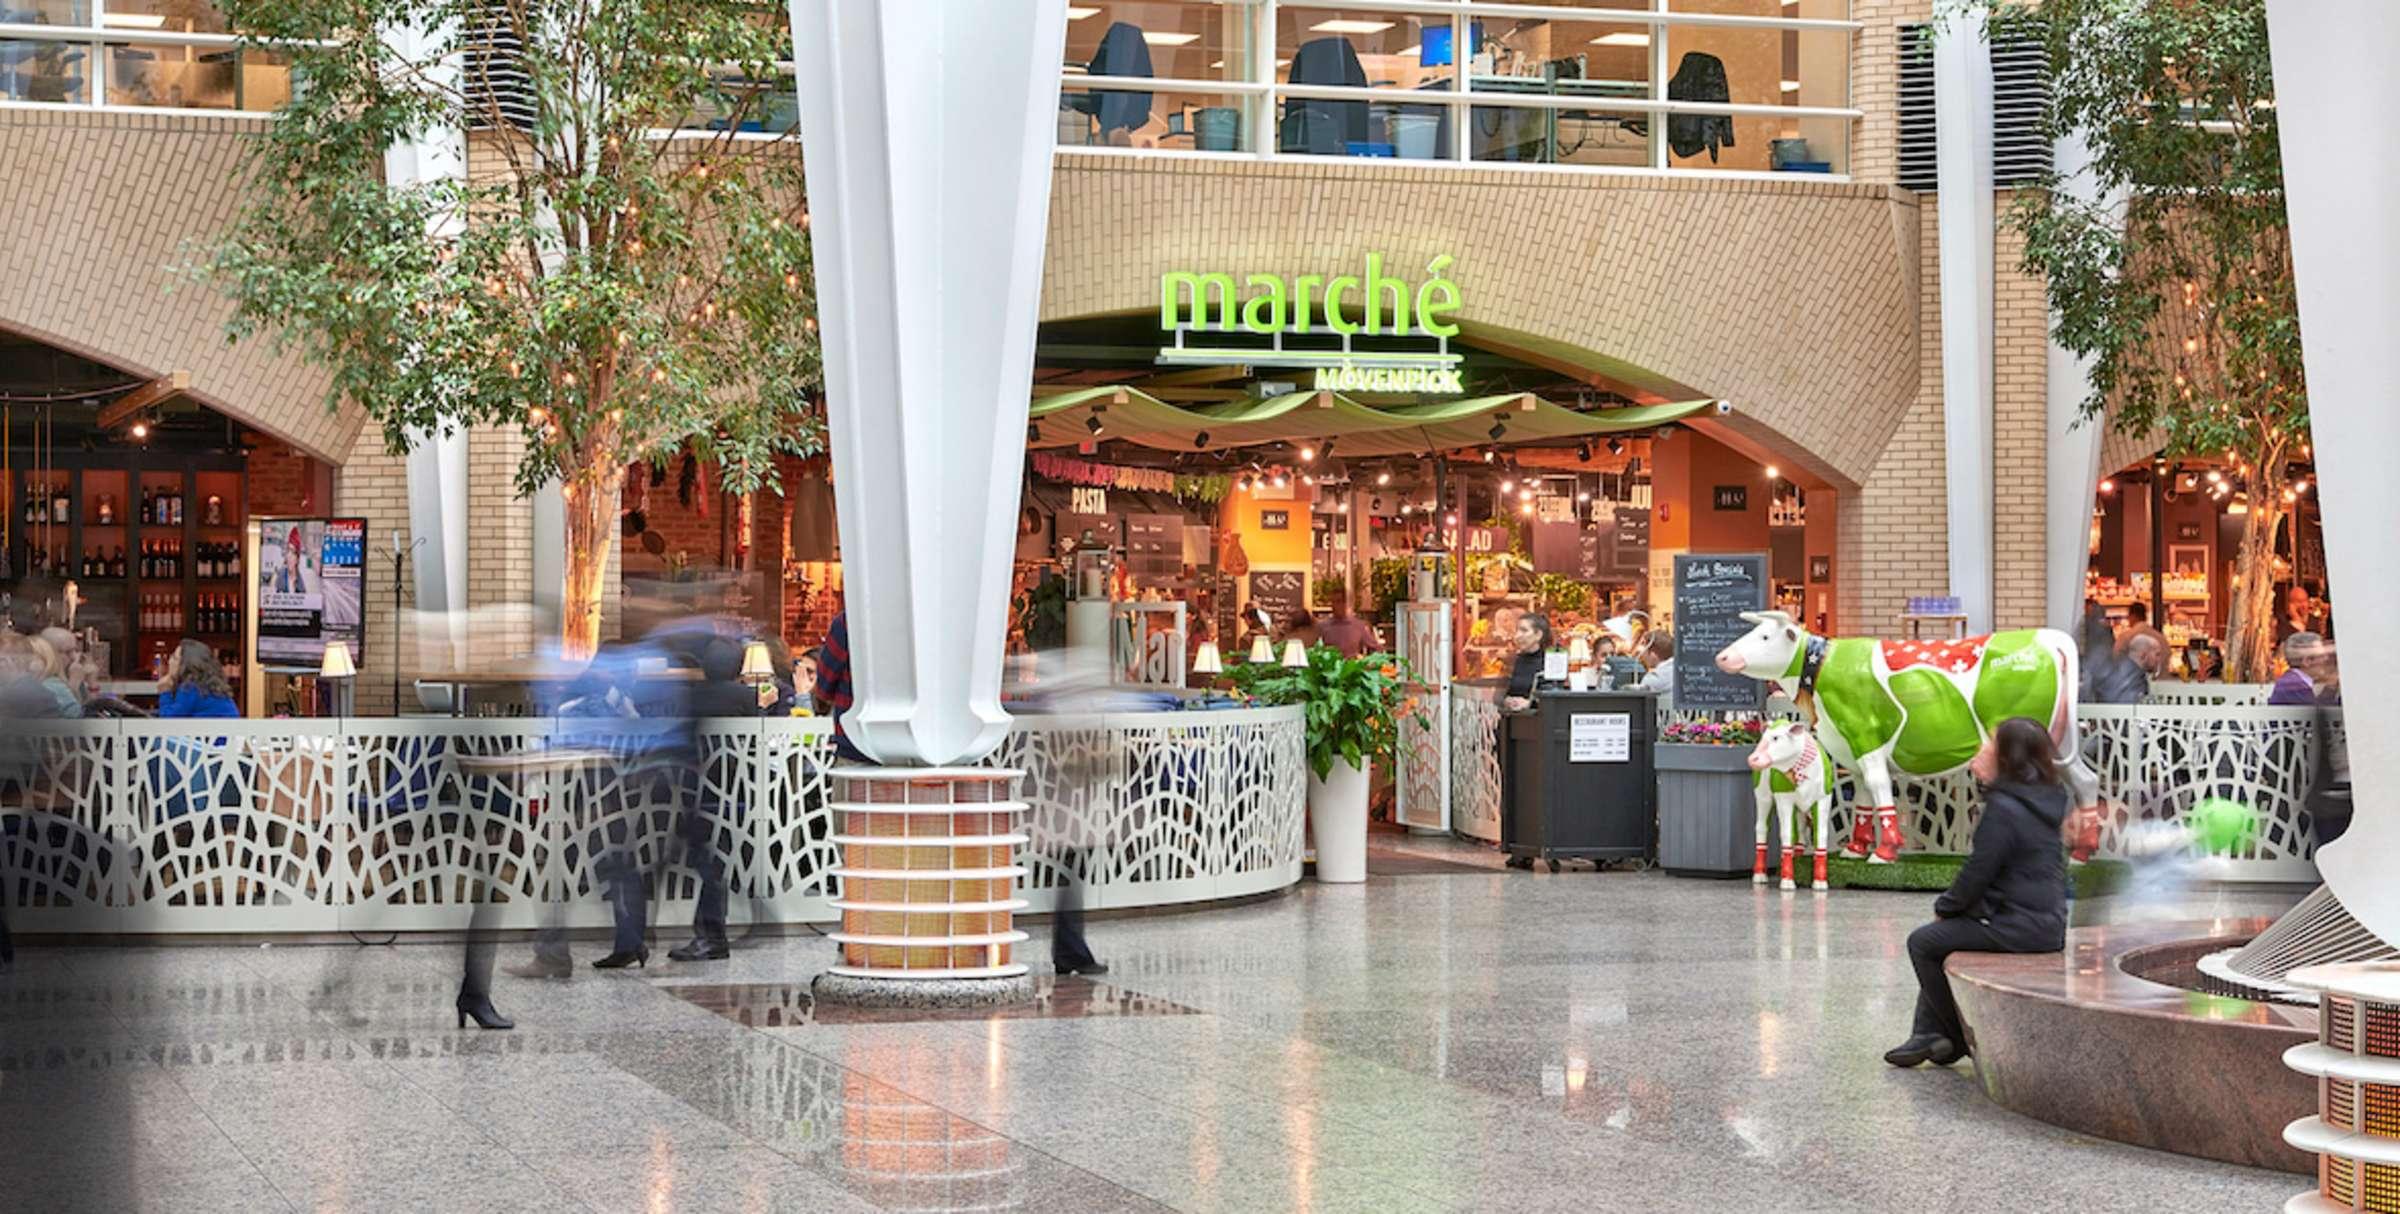 Marche Mövenpick European Marketplace Restaurant Downtown